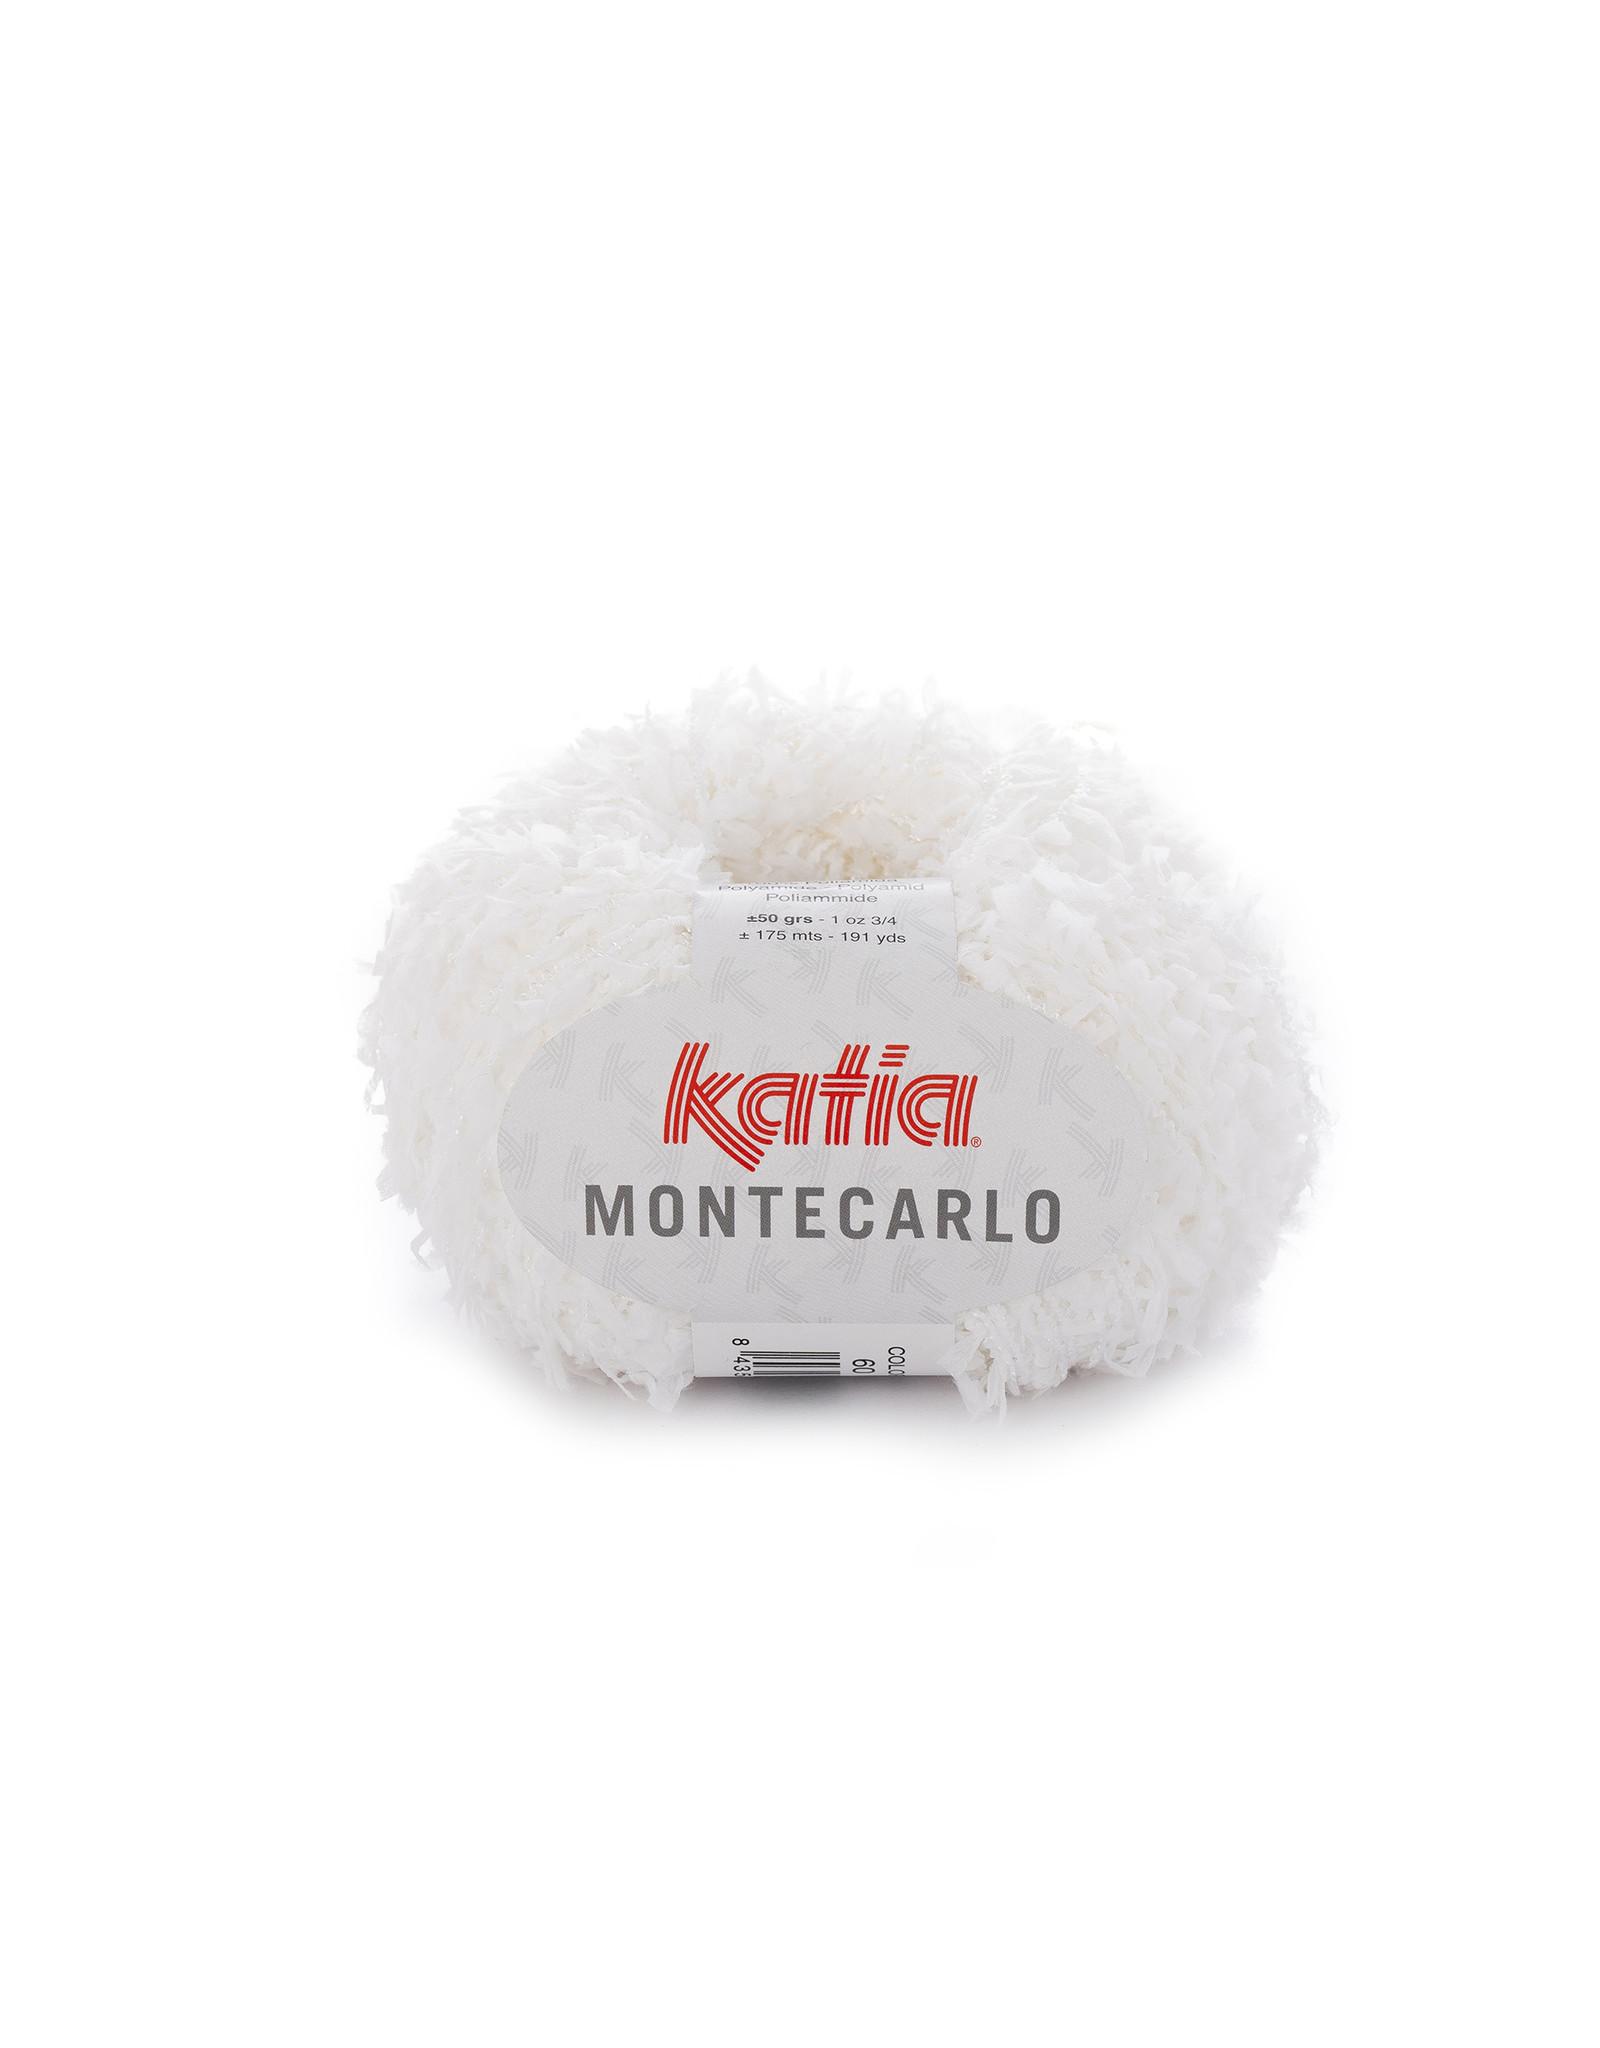 Katia Katia Montecarlo *